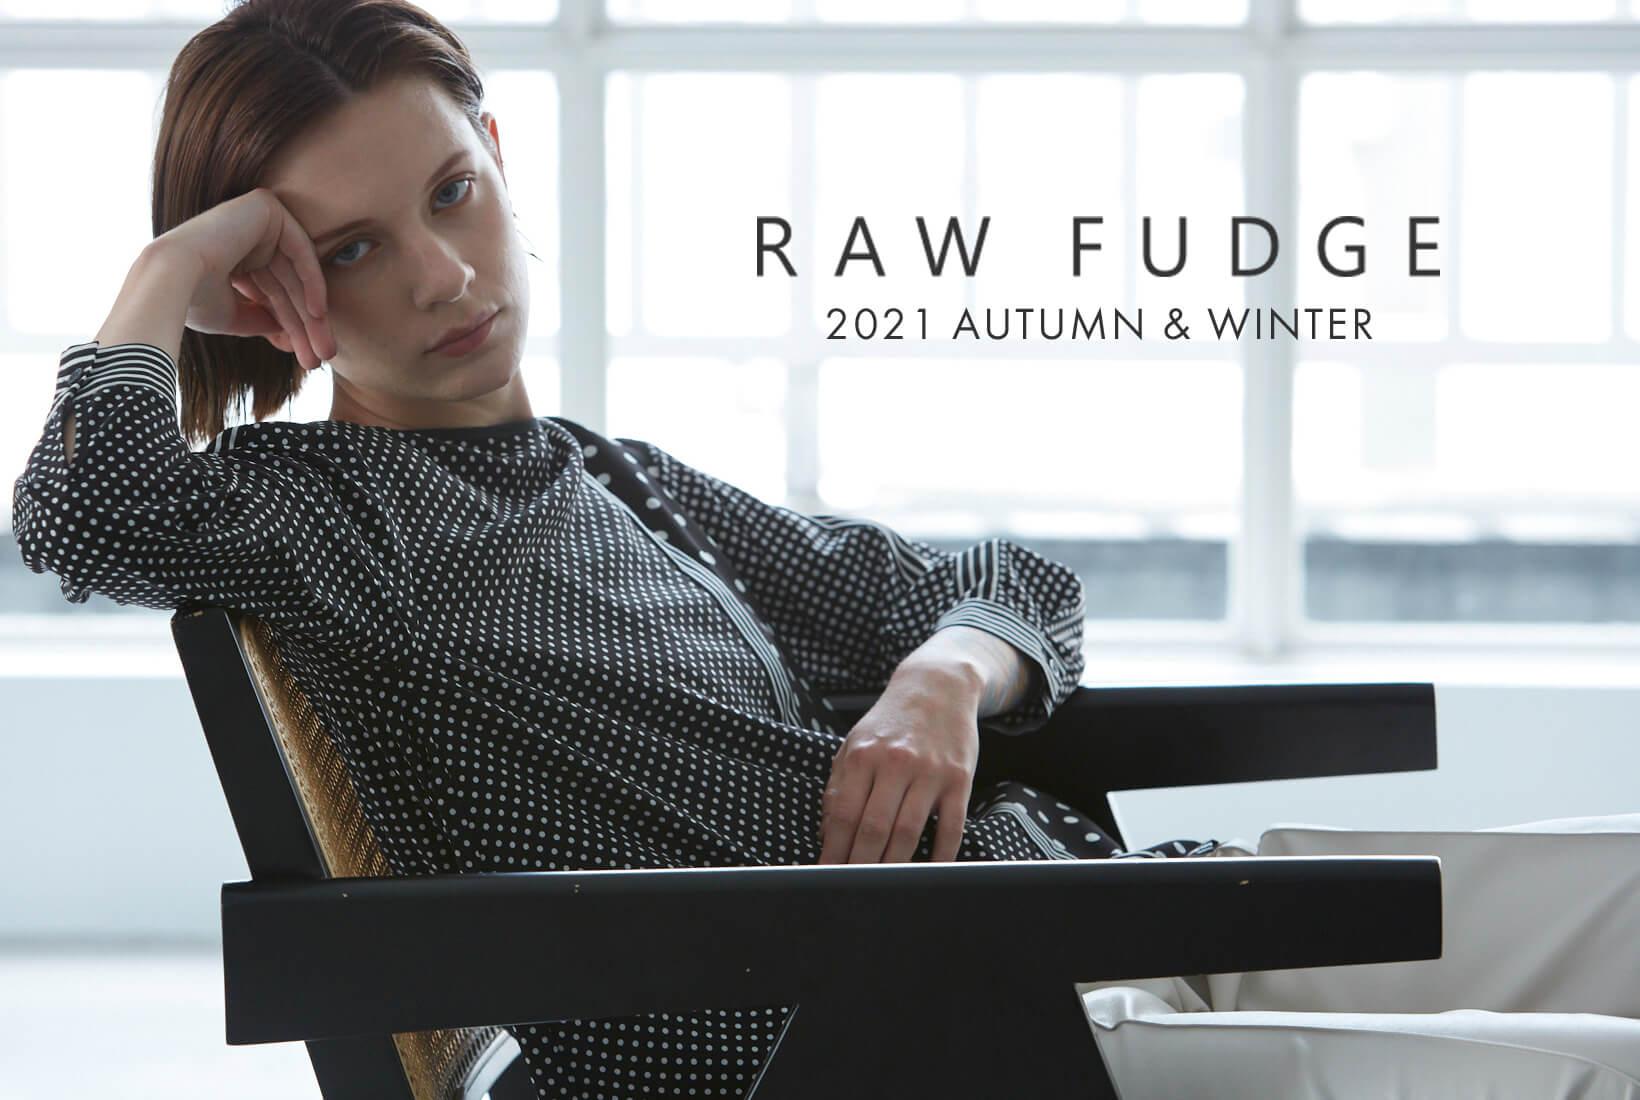 2021AW RAWFUDGE